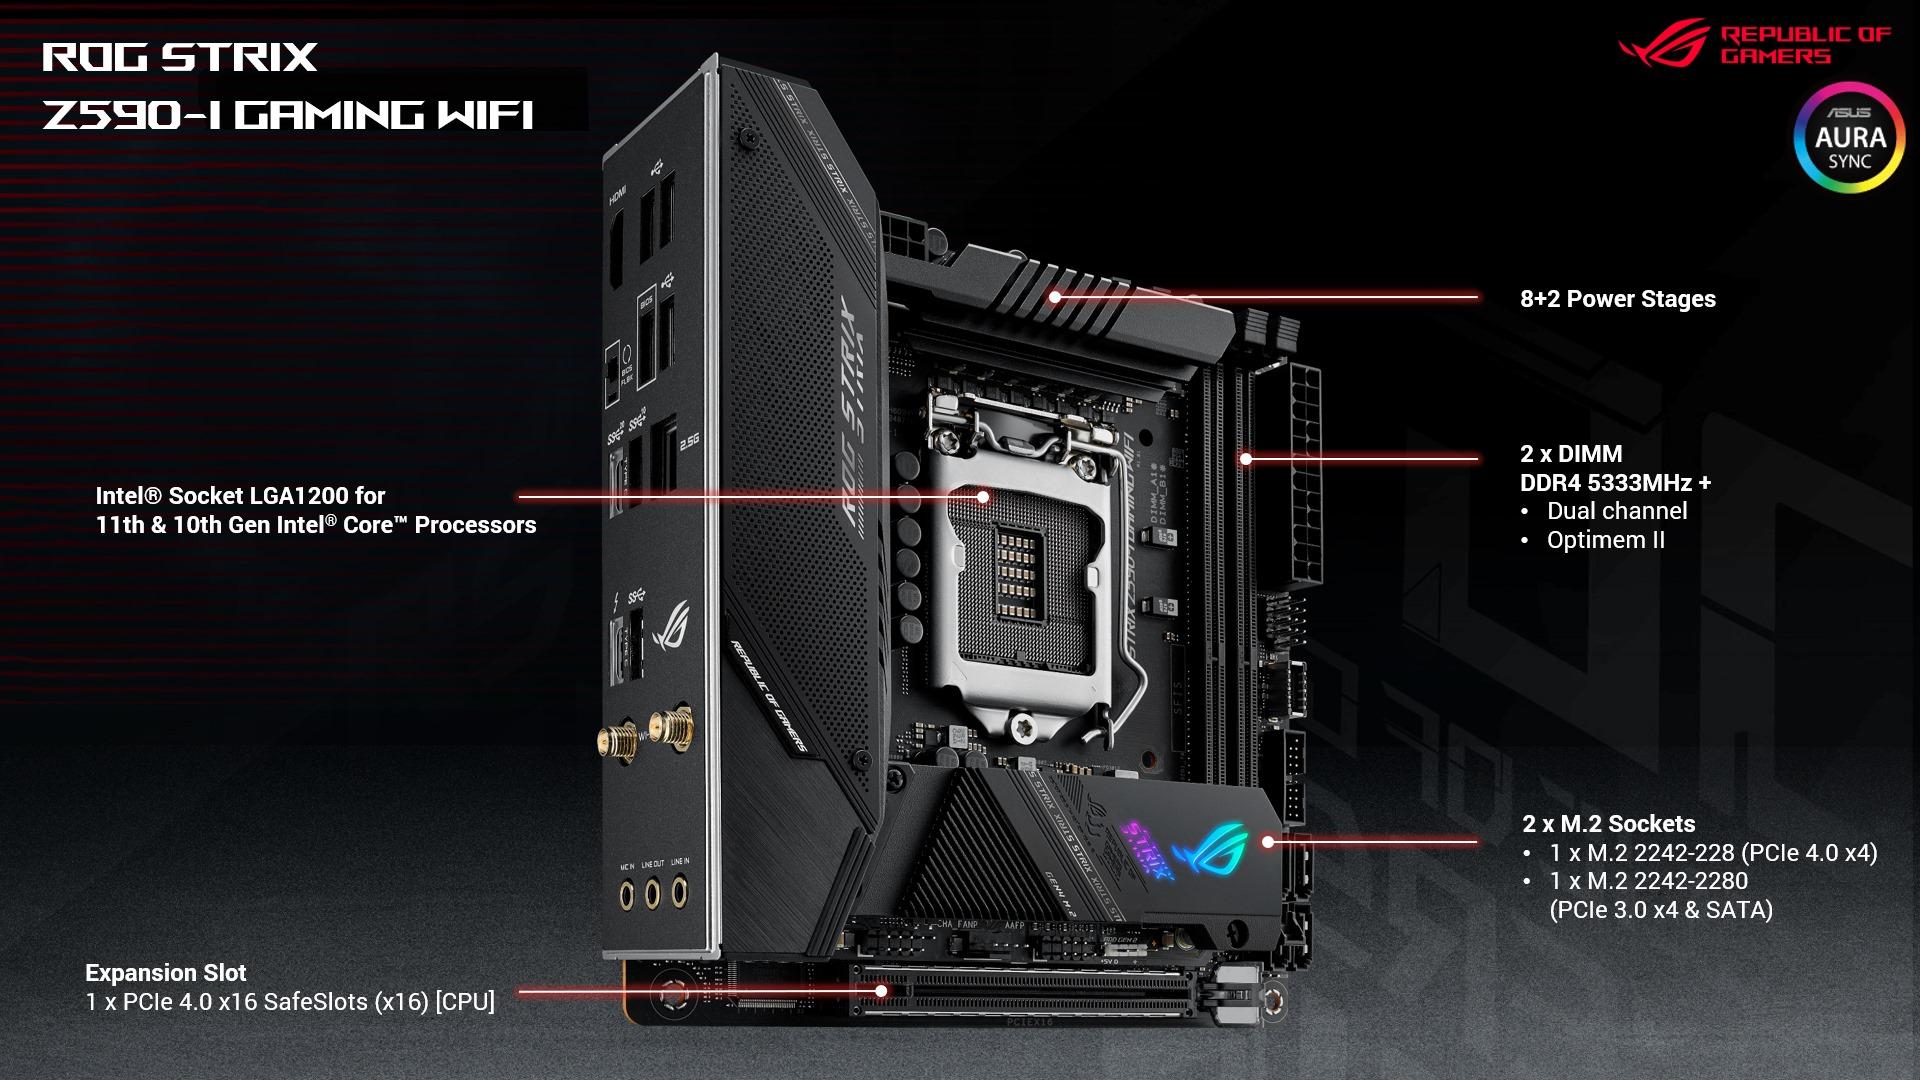 Mainboard ASUS ROG STRIX Z590-I GAMING WIFI